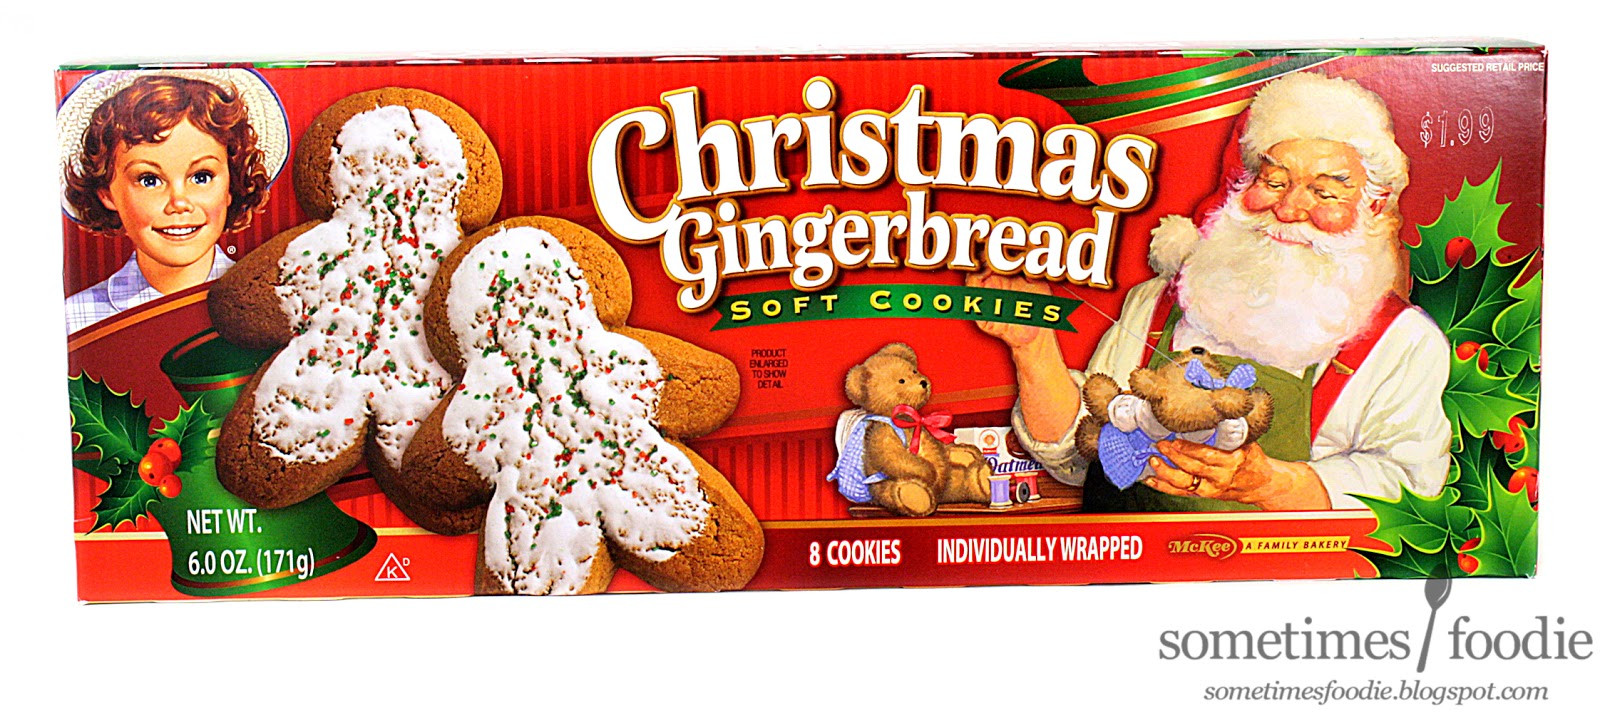 Walmart Christmas Cookies  Sometimes Foo Christmas Gingerbread Soft Cookies Walmart